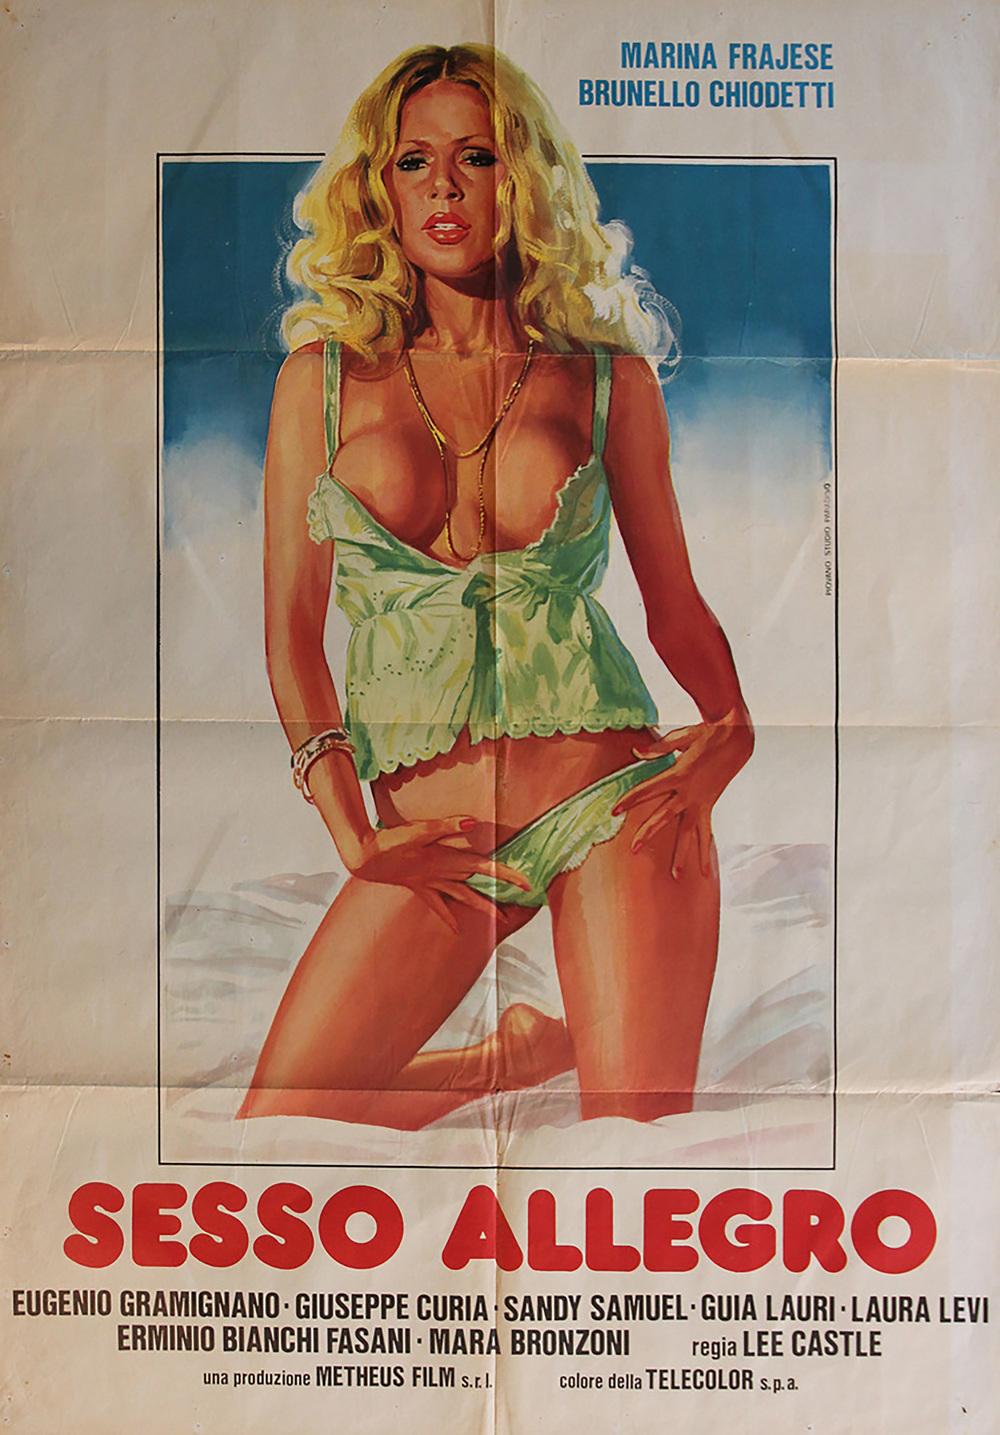 Sesso allegro 1981 italy rare vintagepornbaycom - 1 2